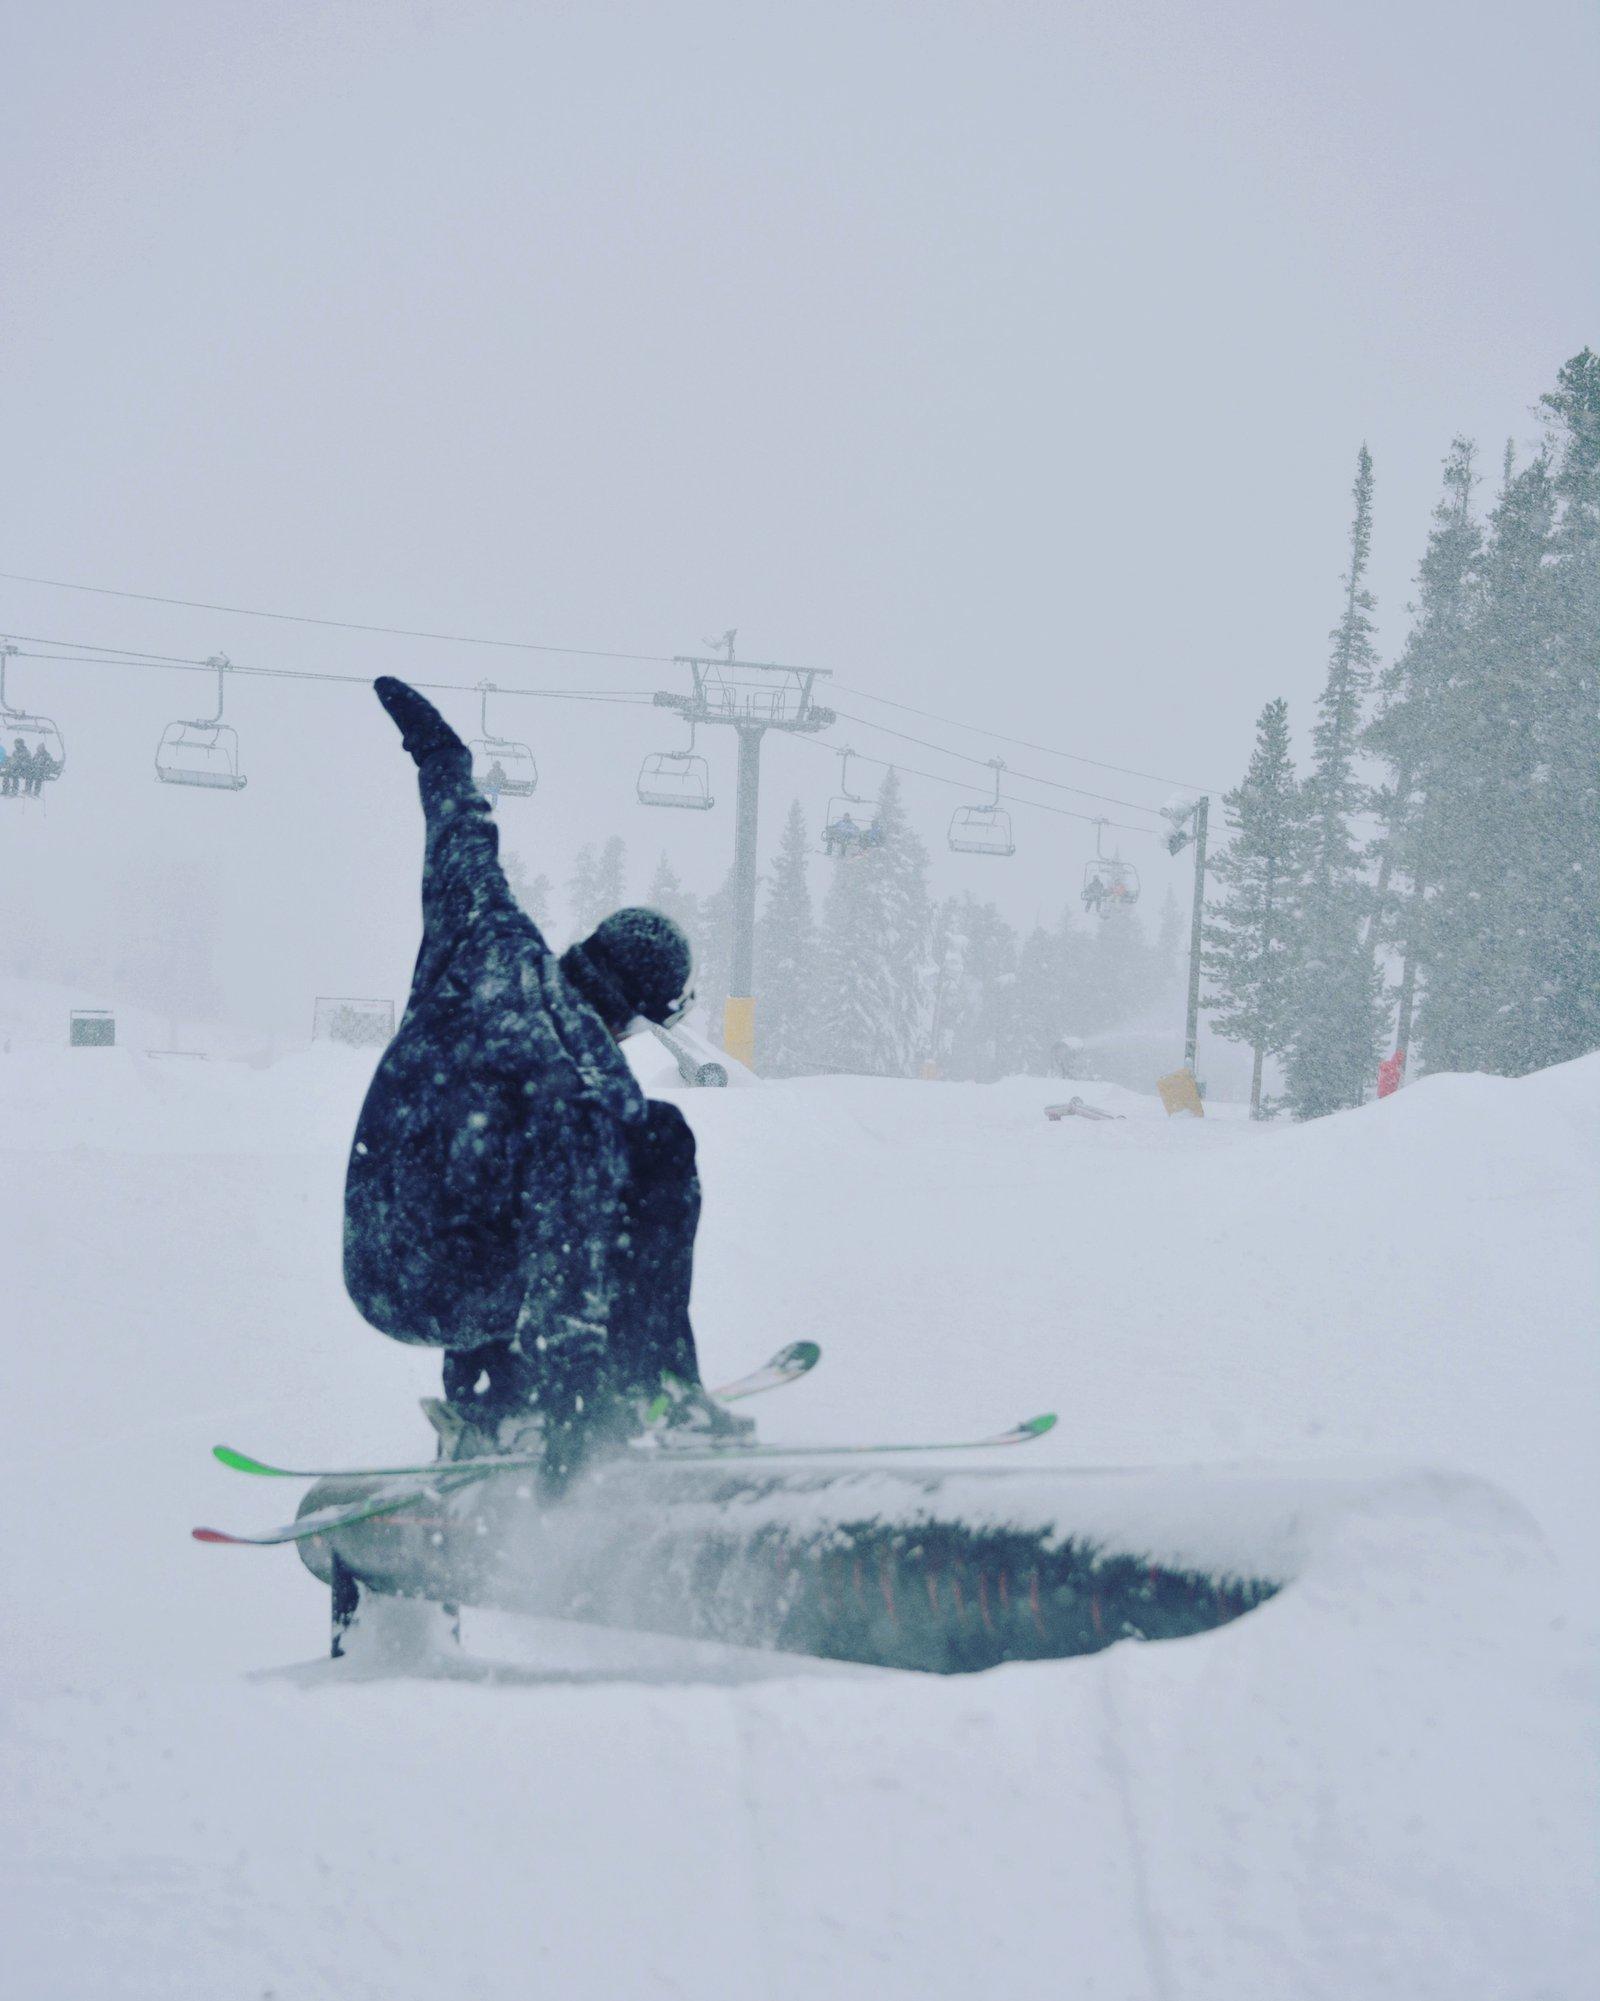 Blunt slide Snowy Days At Key